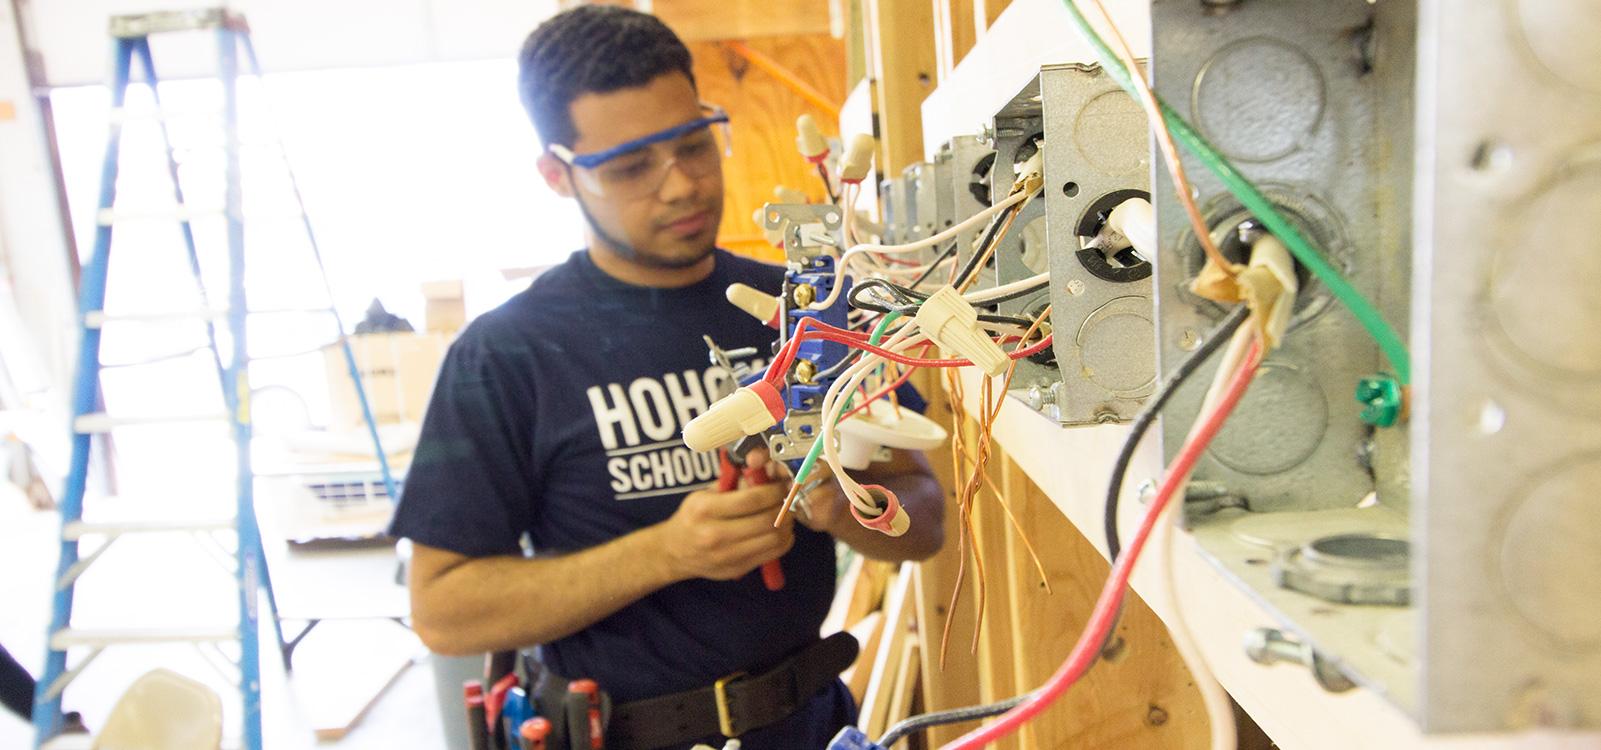 photo-header-program-electrician-training-hohokus-school-eastwick-college